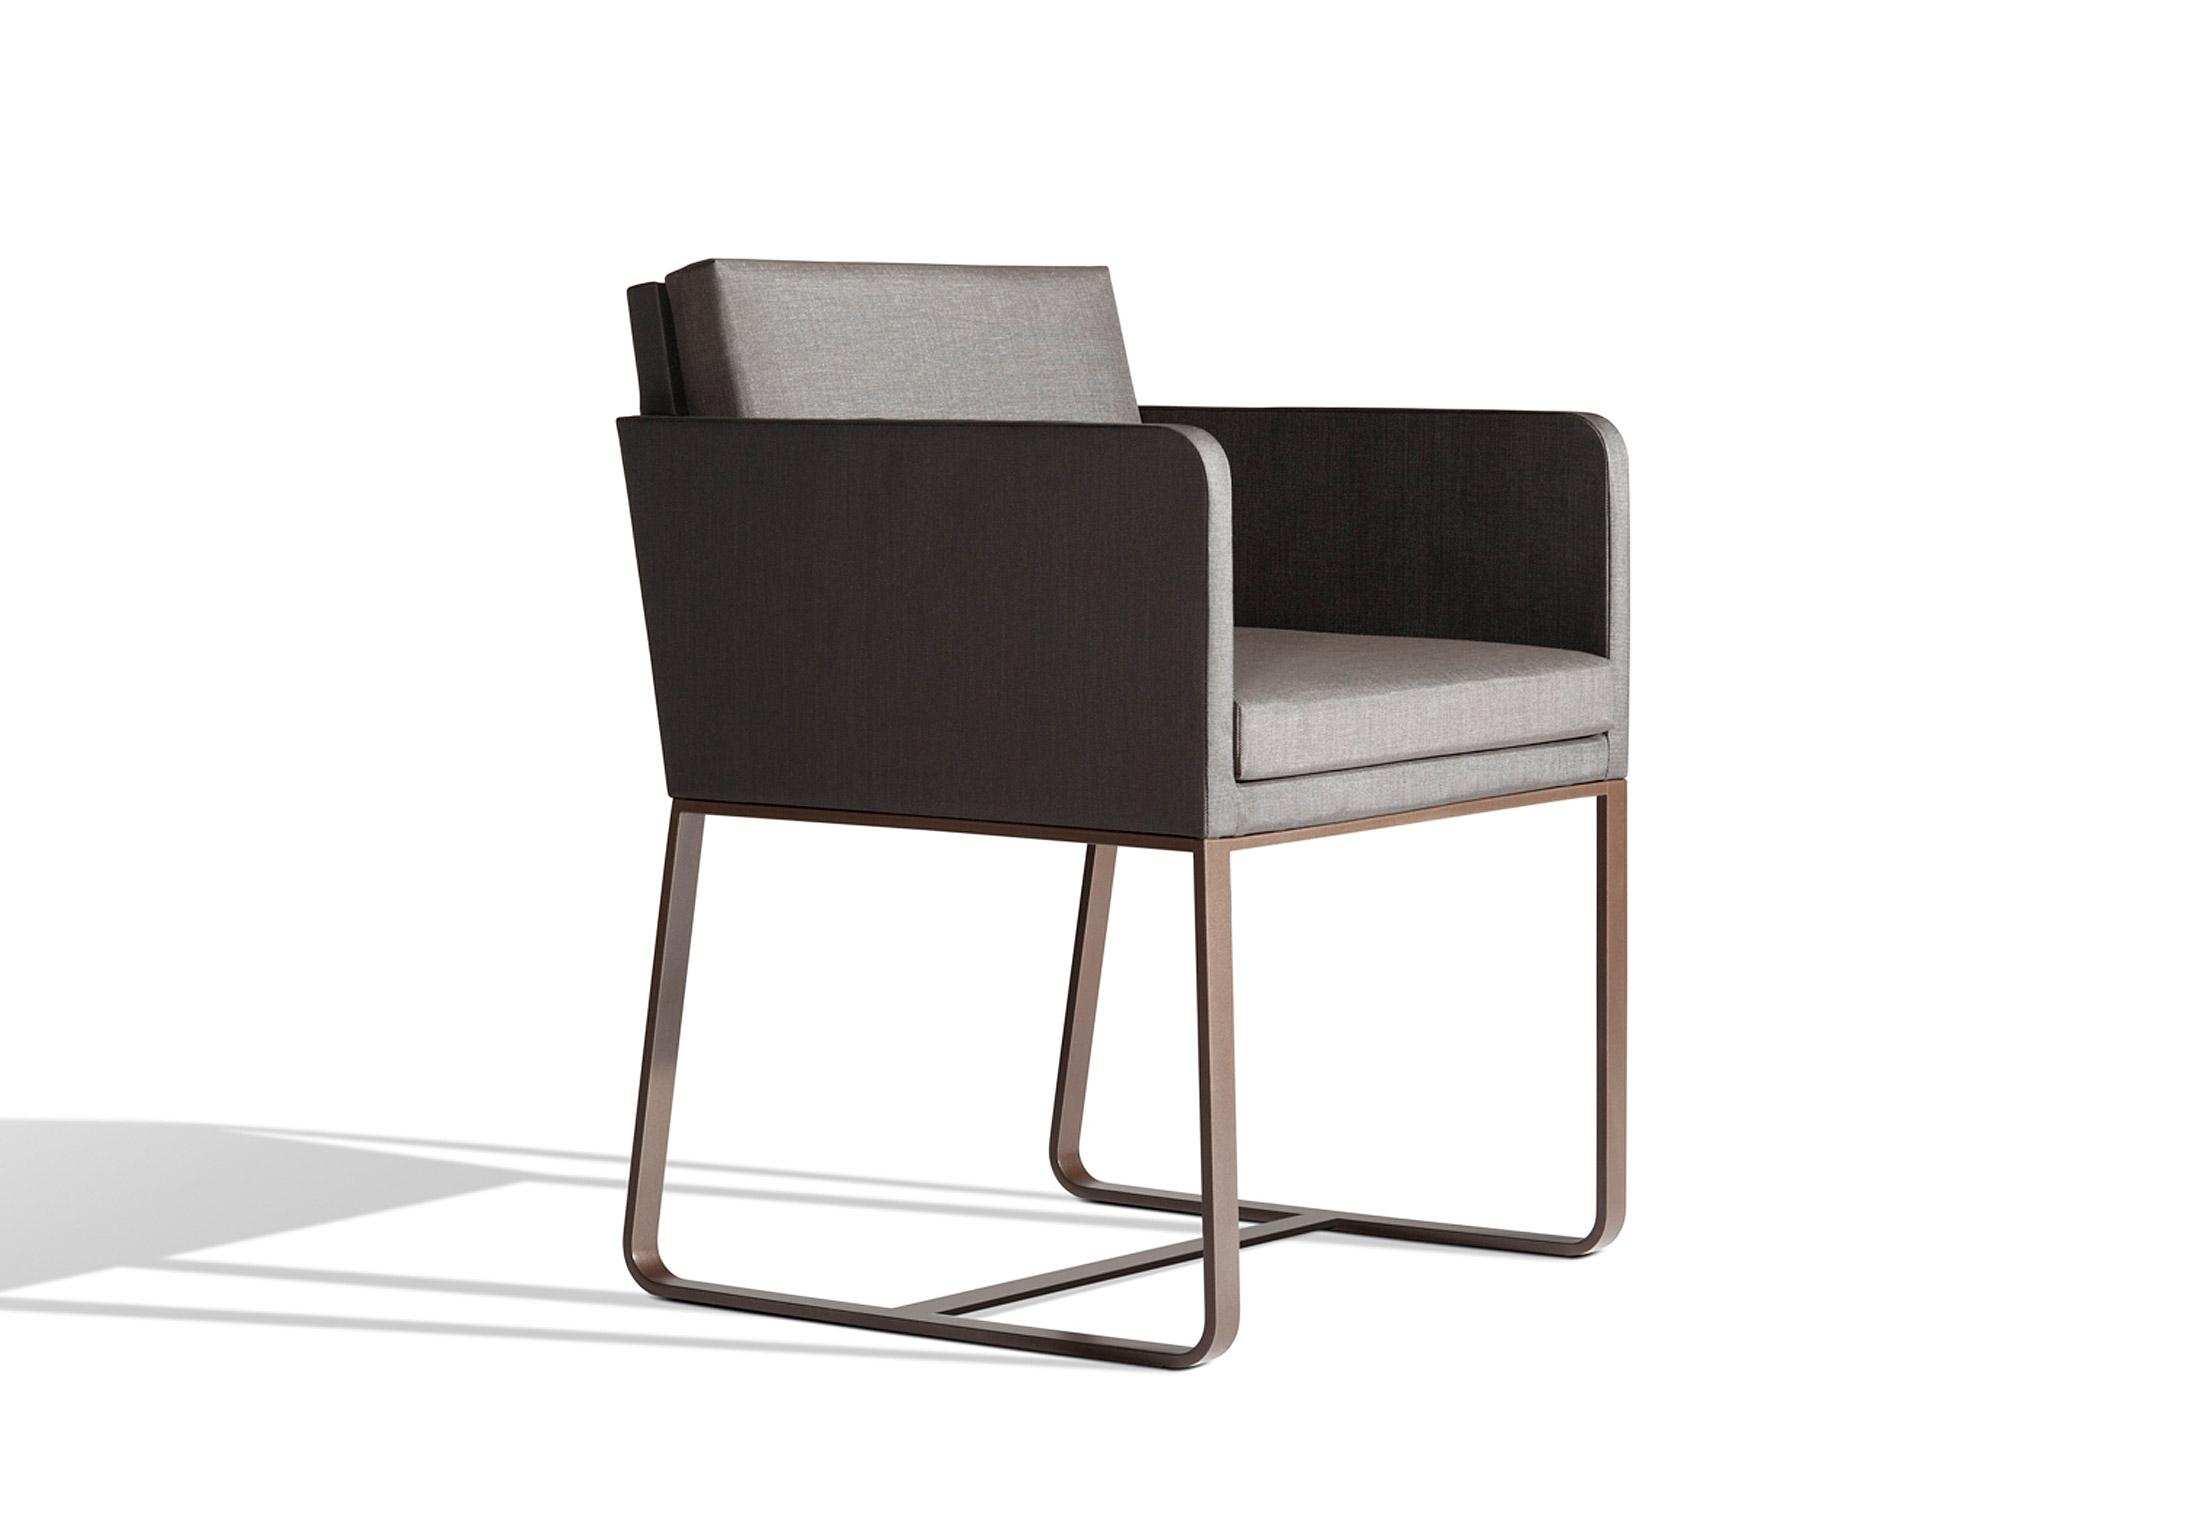 moods stuhl von bivaq stylepark. Black Bedroom Furniture Sets. Home Design Ideas